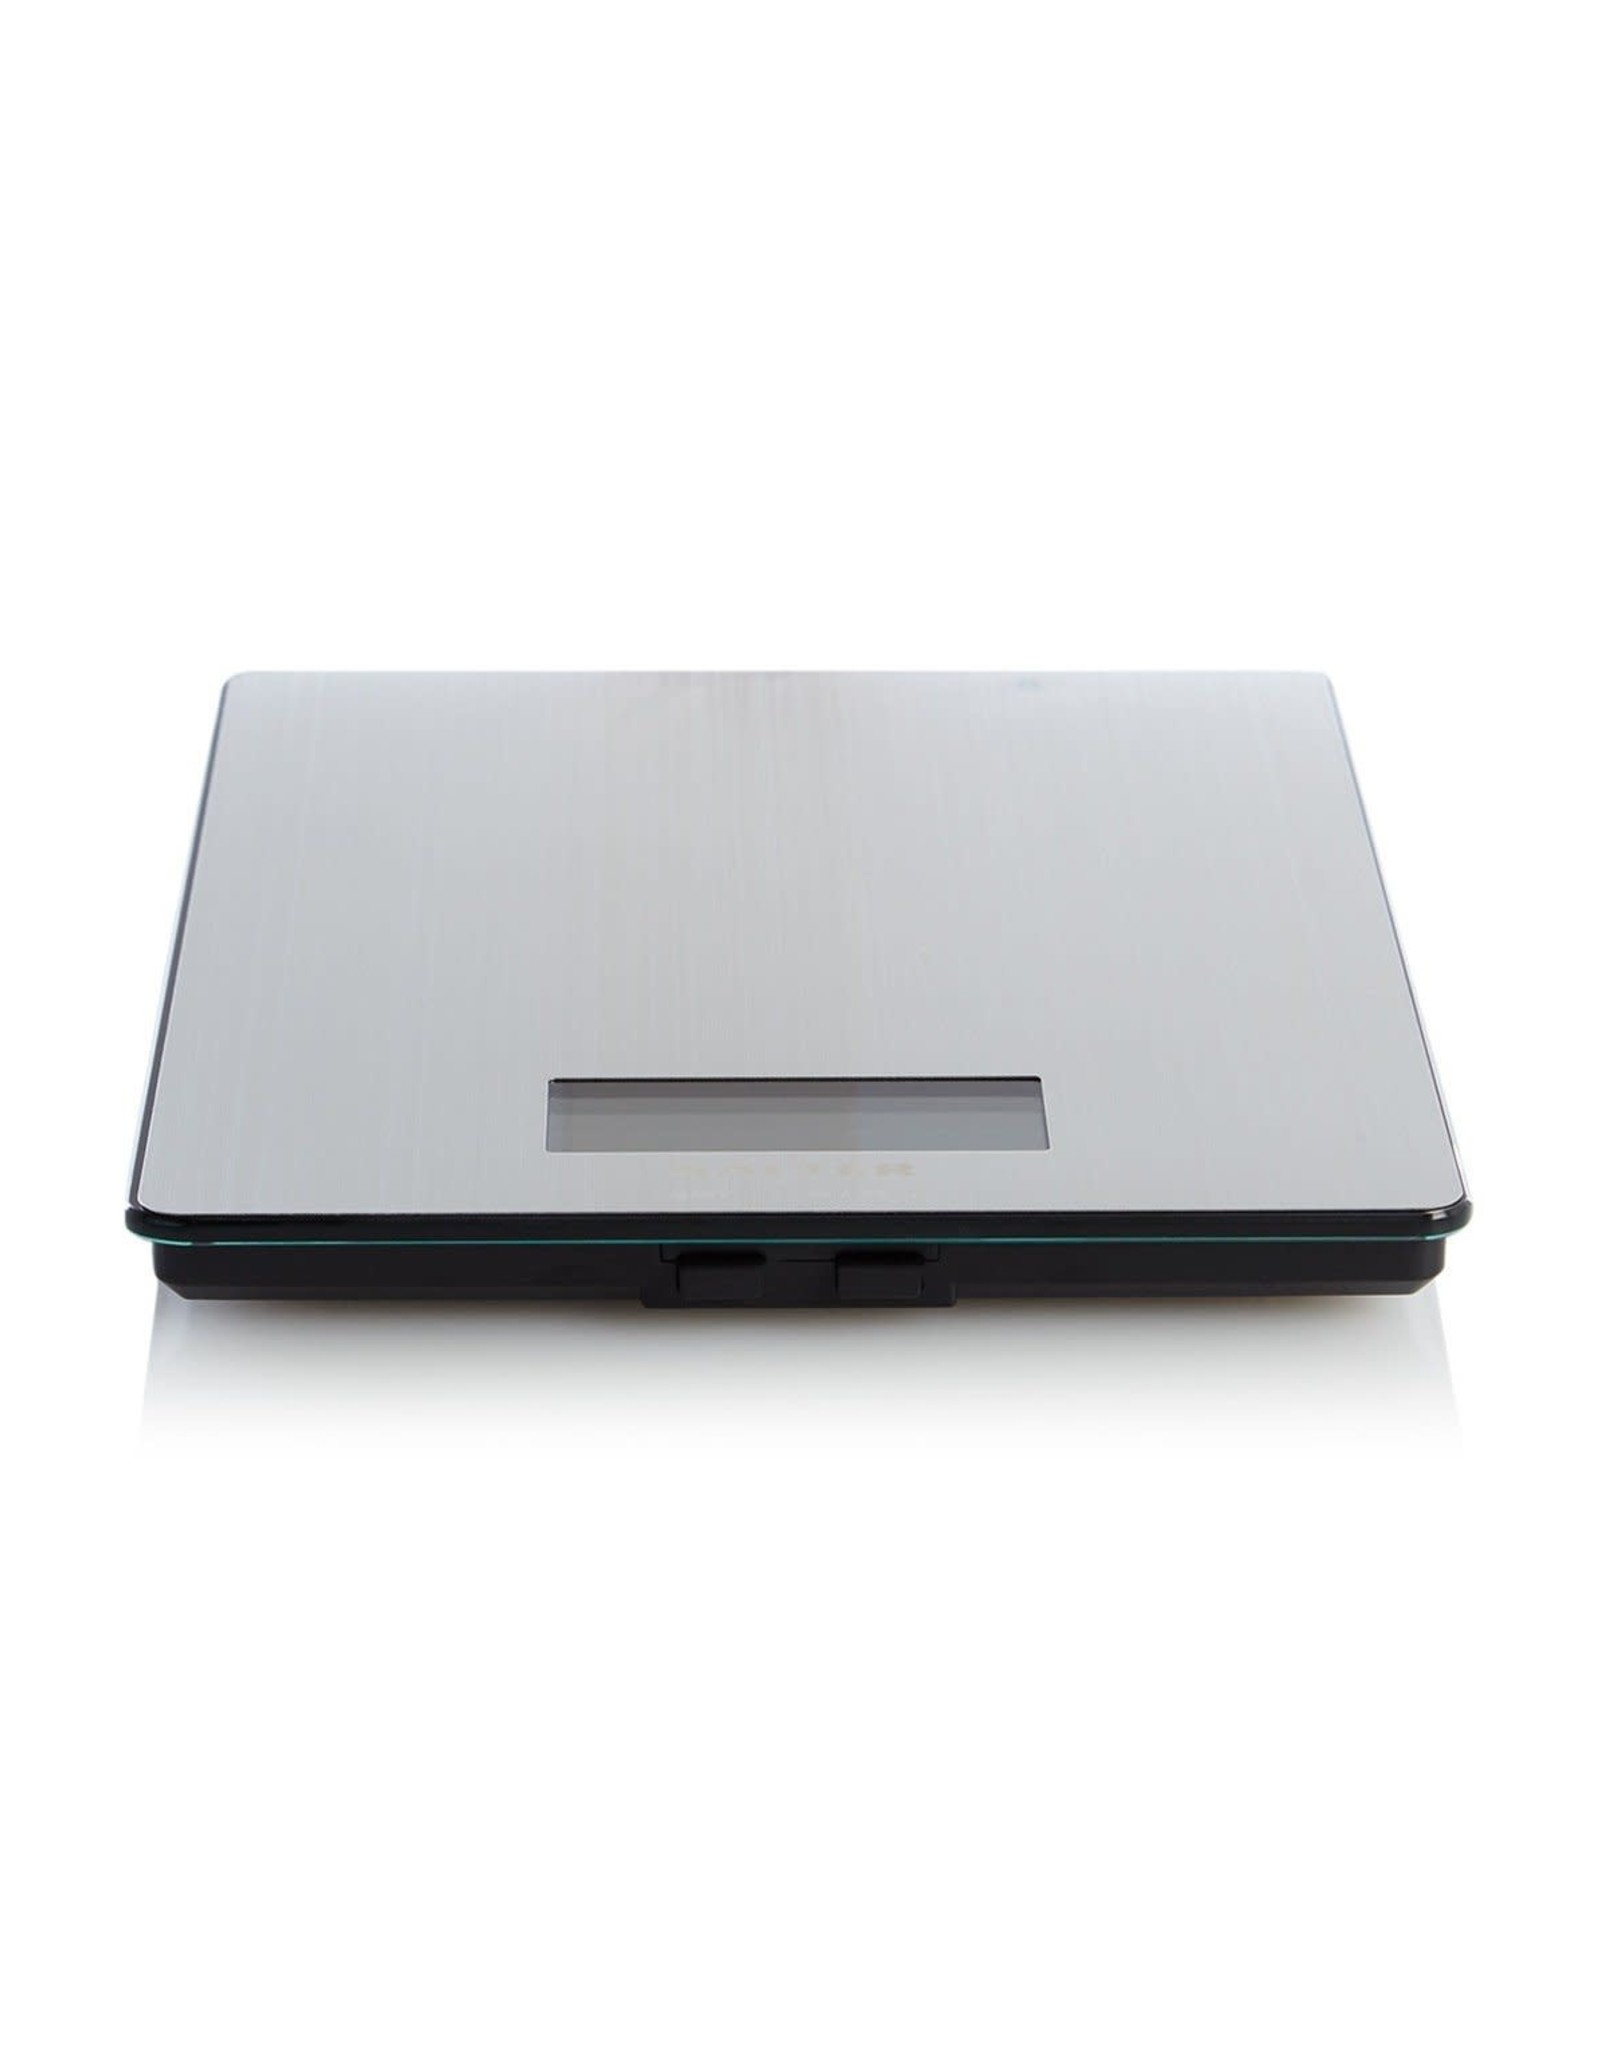 Salter. Digitale keukenweegschaal SA1103 SSDR.